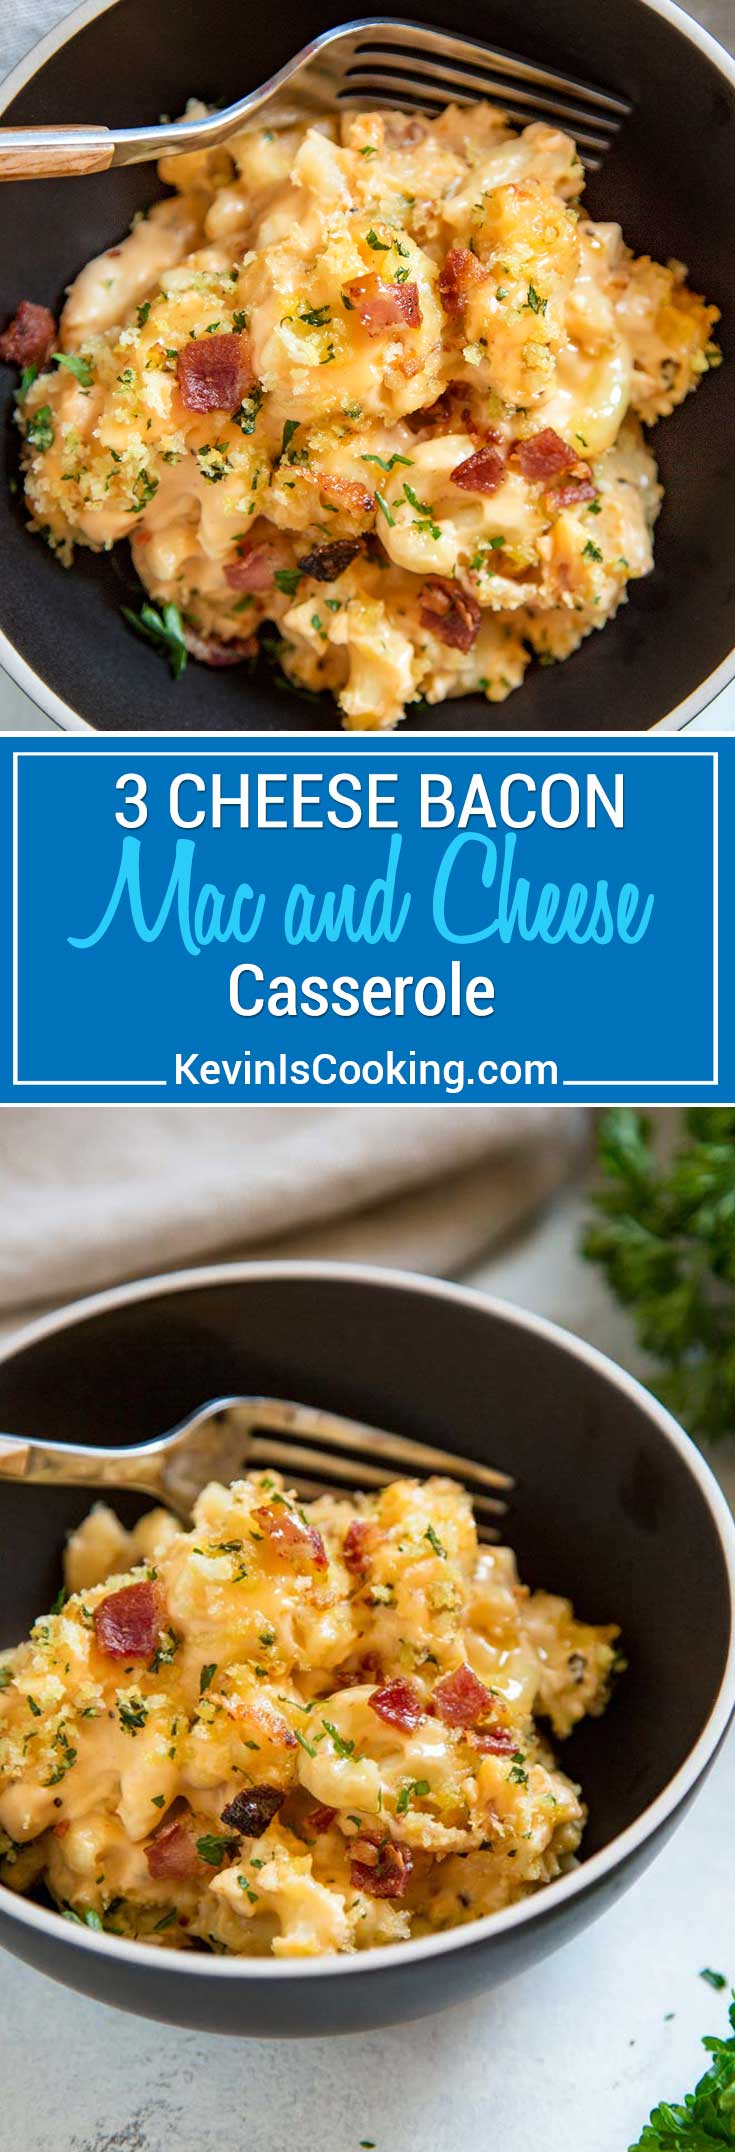 Bacon Mac and Cheese Casserole #bakedmacandcheeserecipe